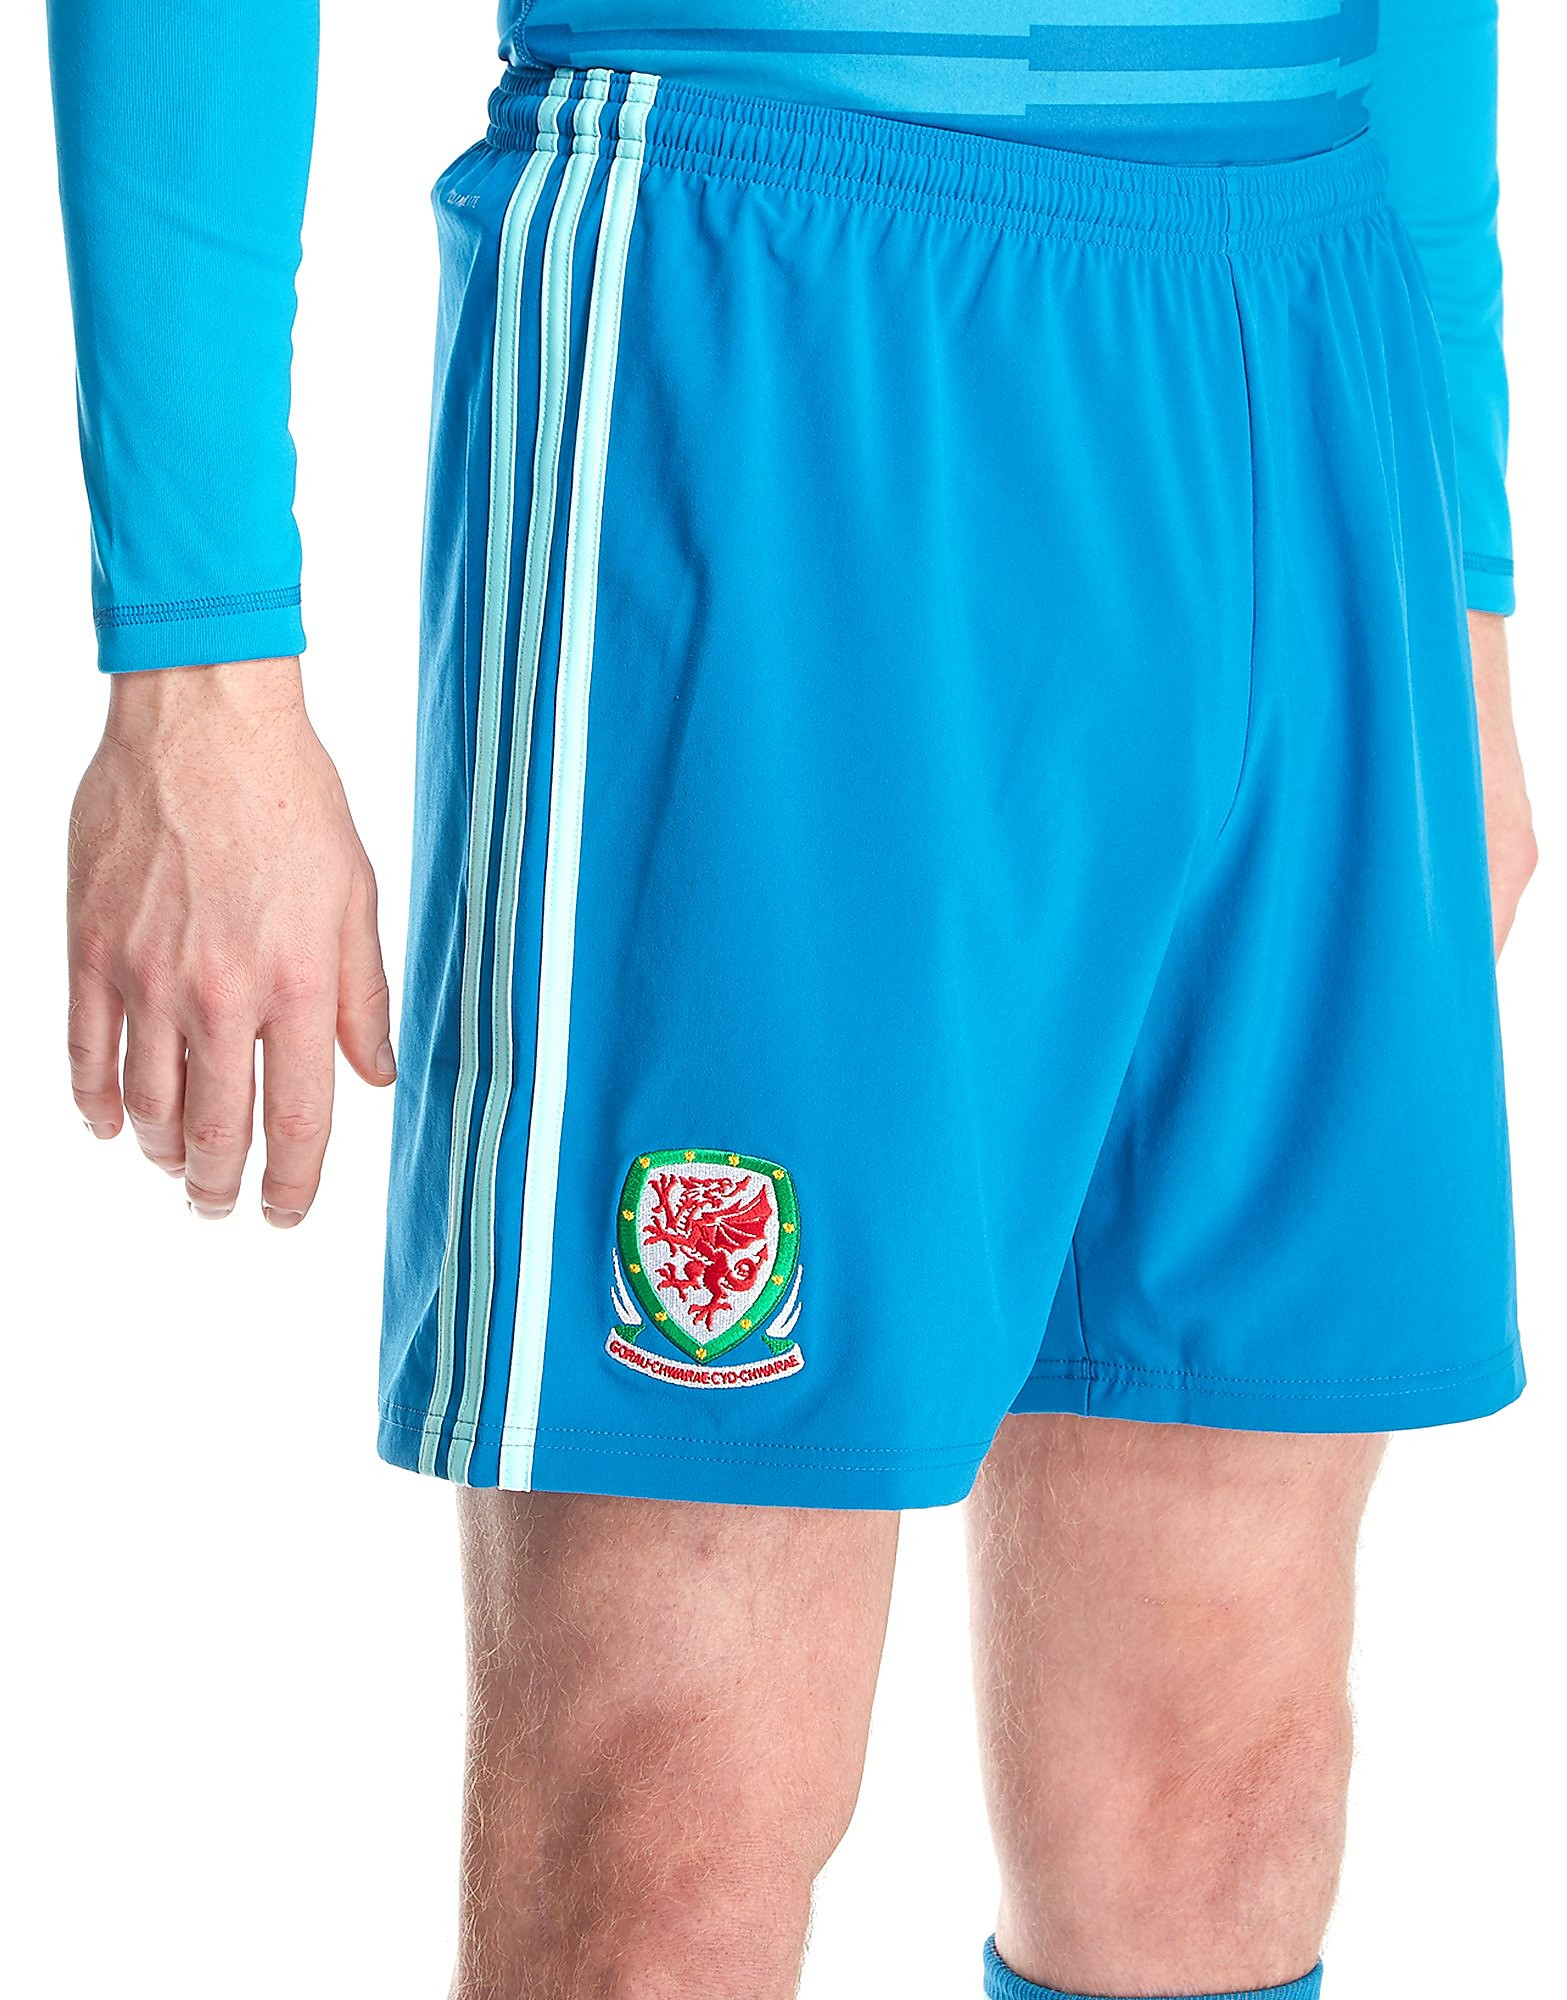 adidas pantalón corto de portero de Gales 2018 1.ª equipación